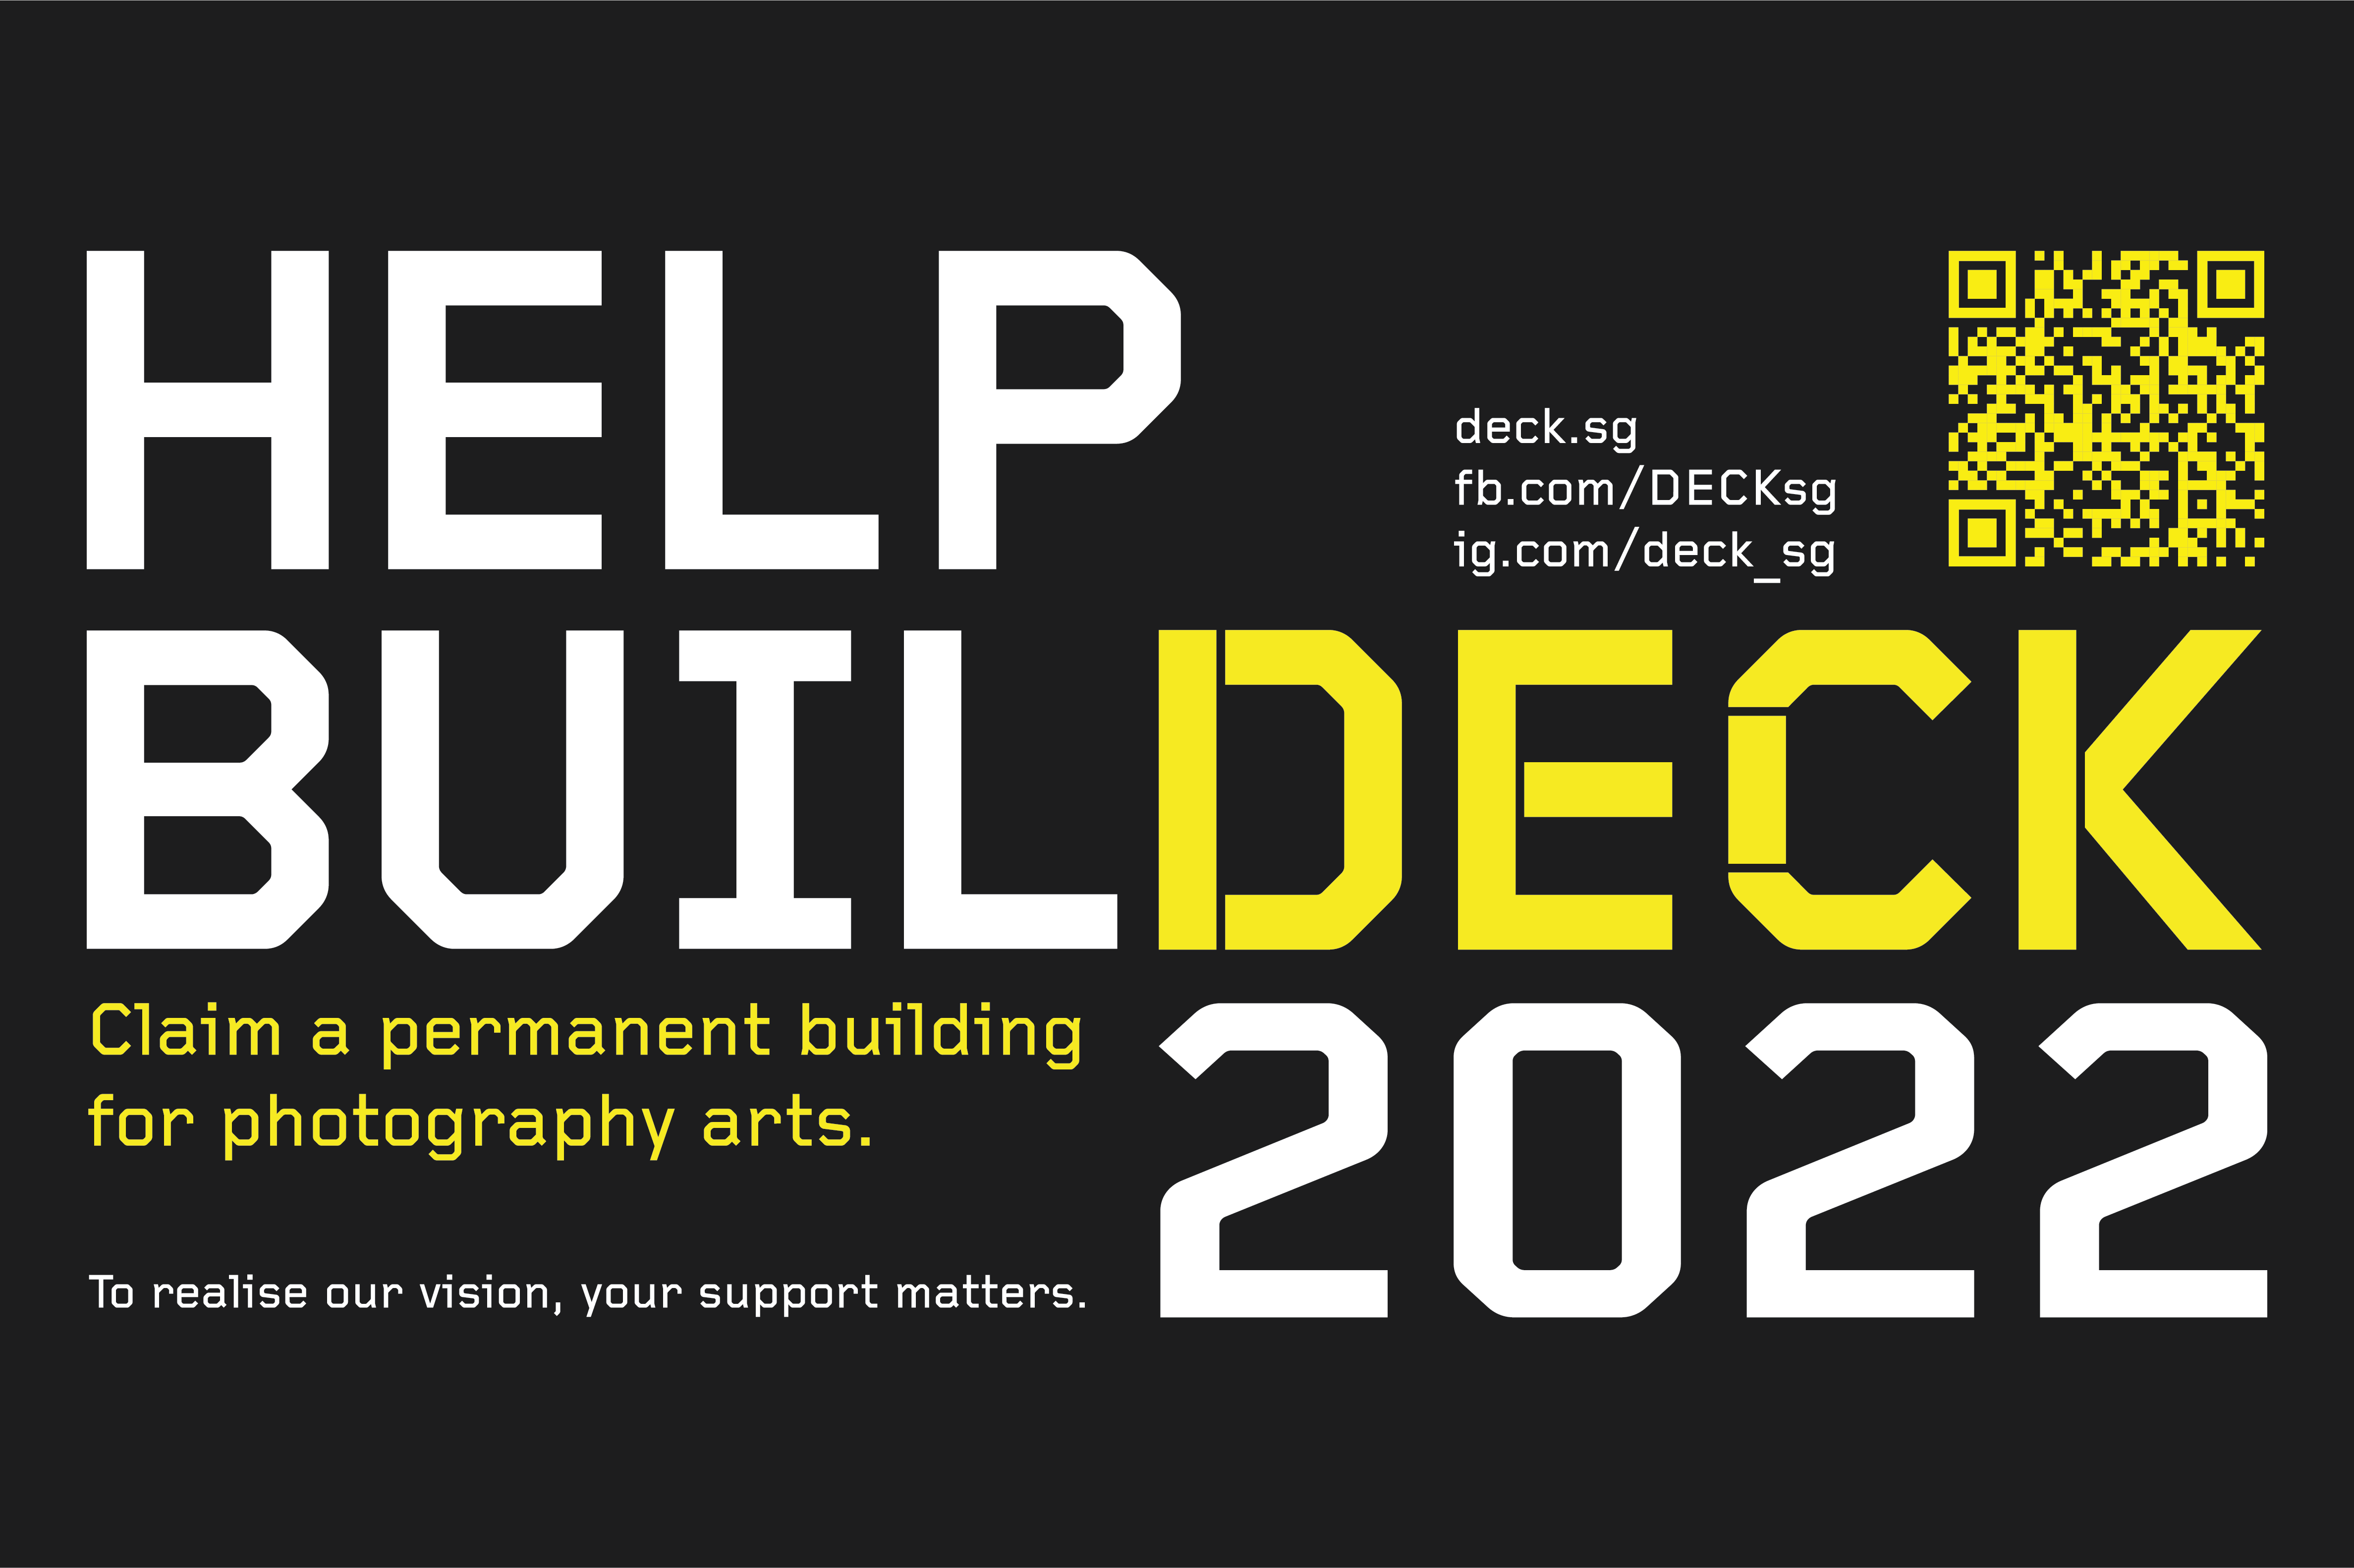 HELP #BUILDECK!